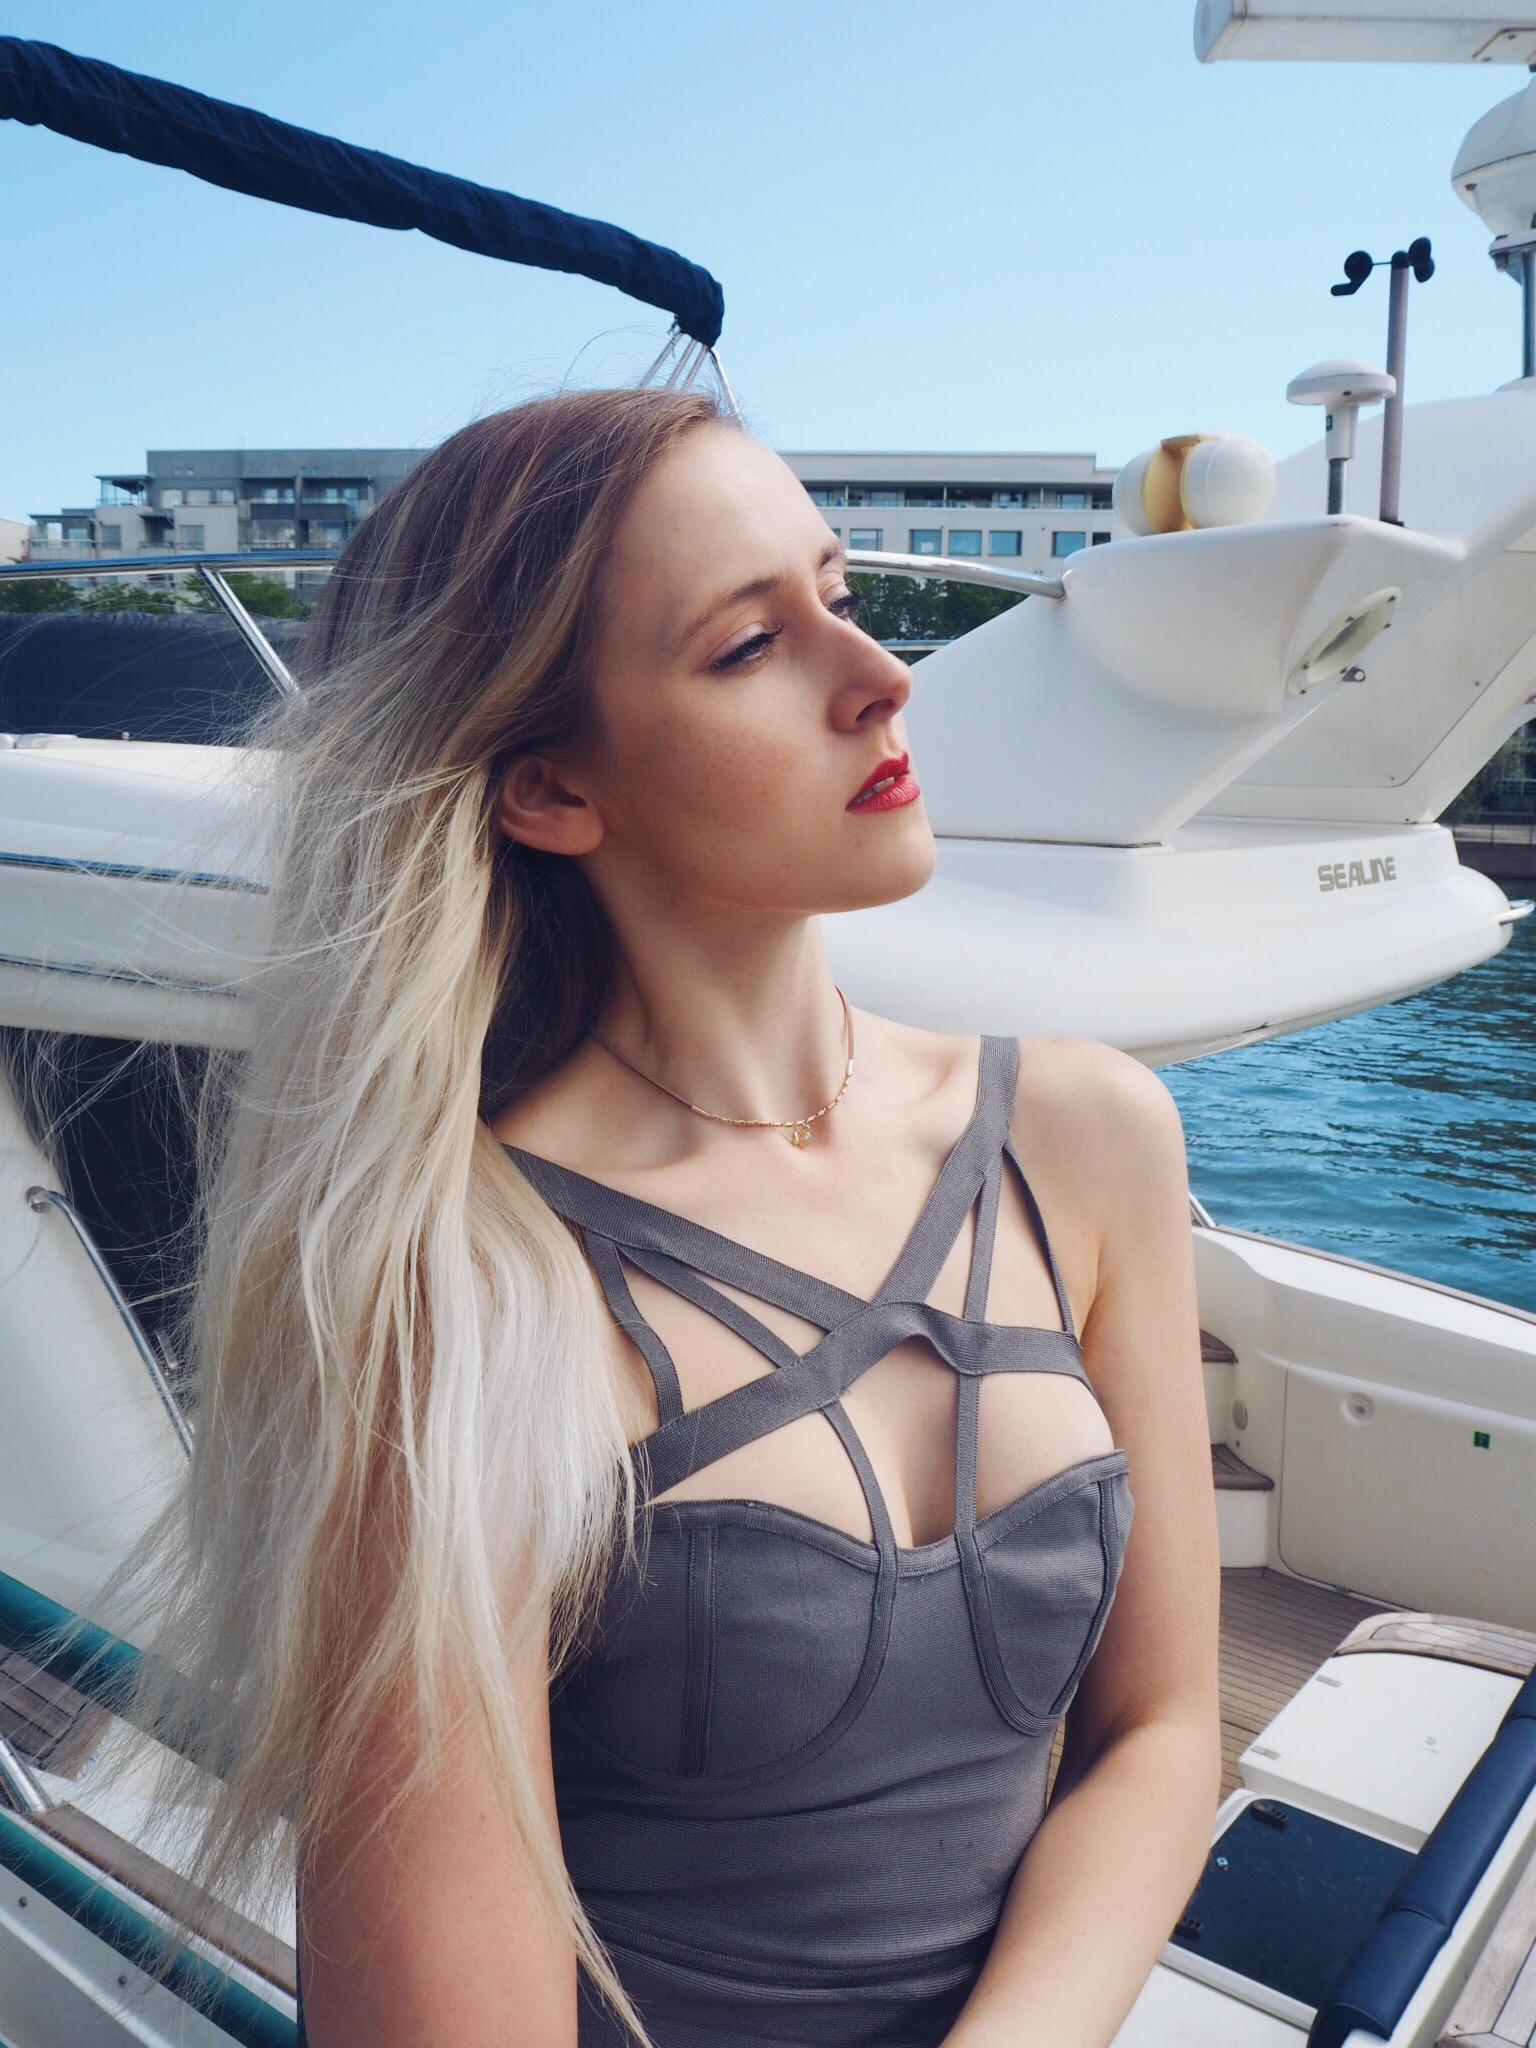 yachtmodel-5.jpg